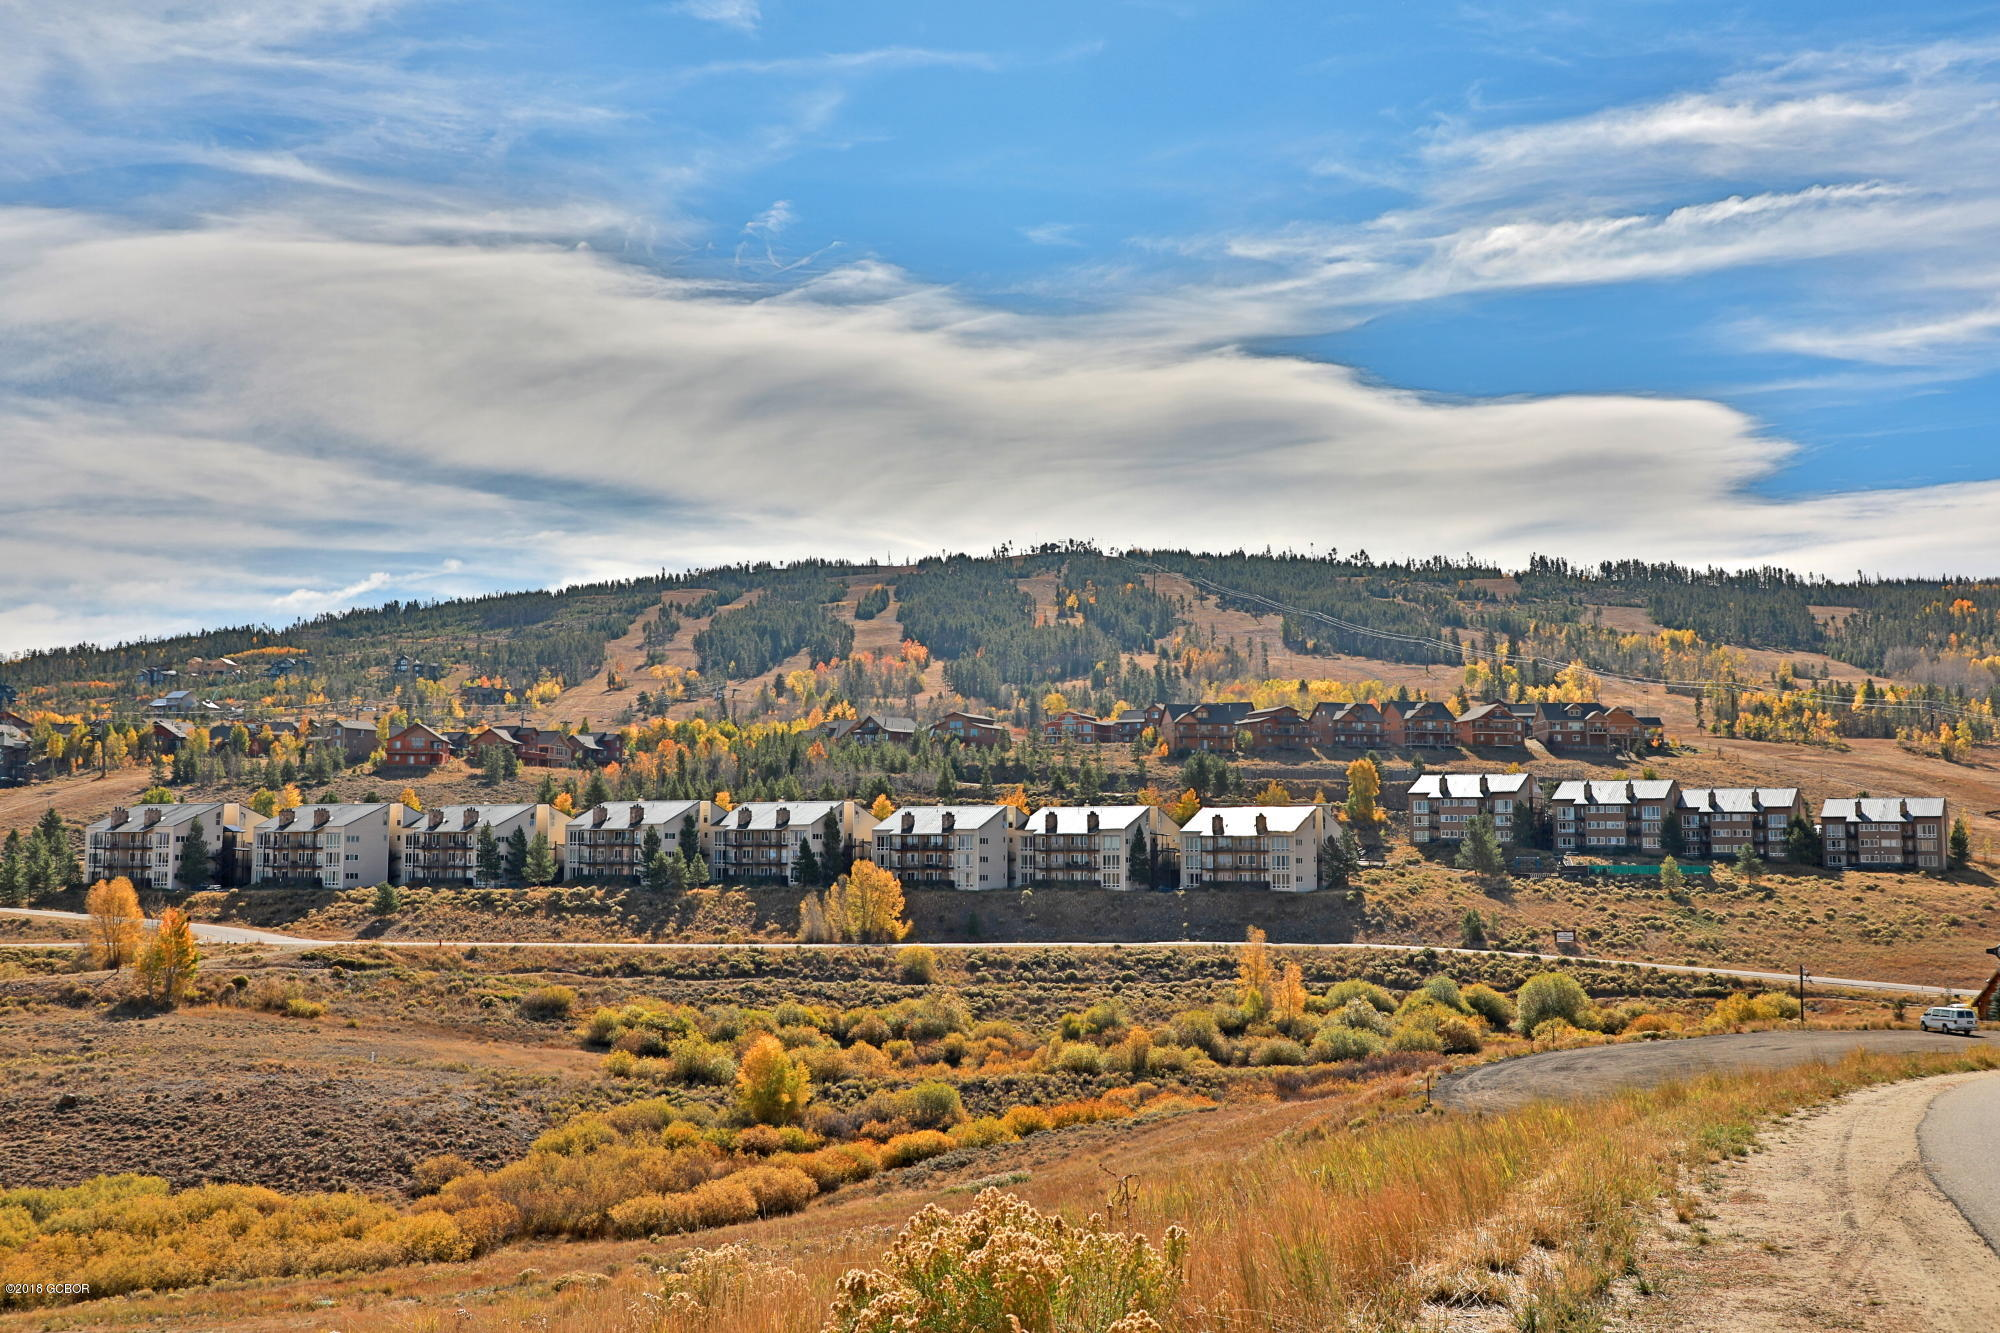 MLS# 18-1408 - 1 - 96  Mountainside, Granby, CO 80446